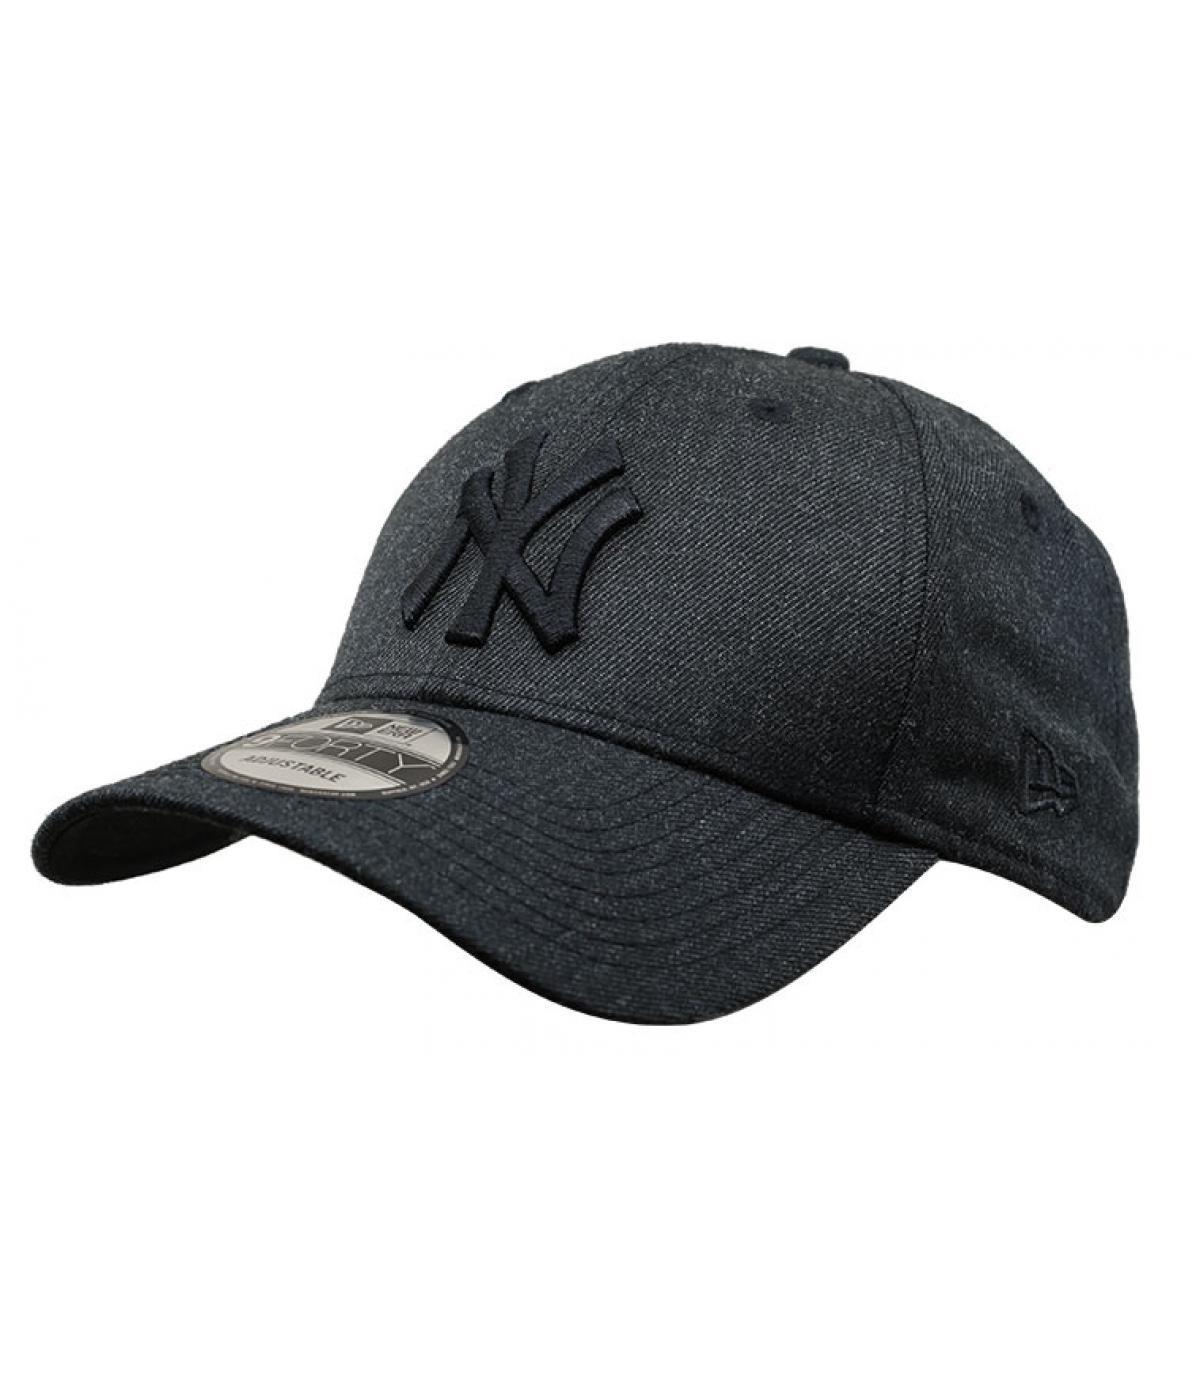 Dettagli Winterized The League NY 940 black - image 2